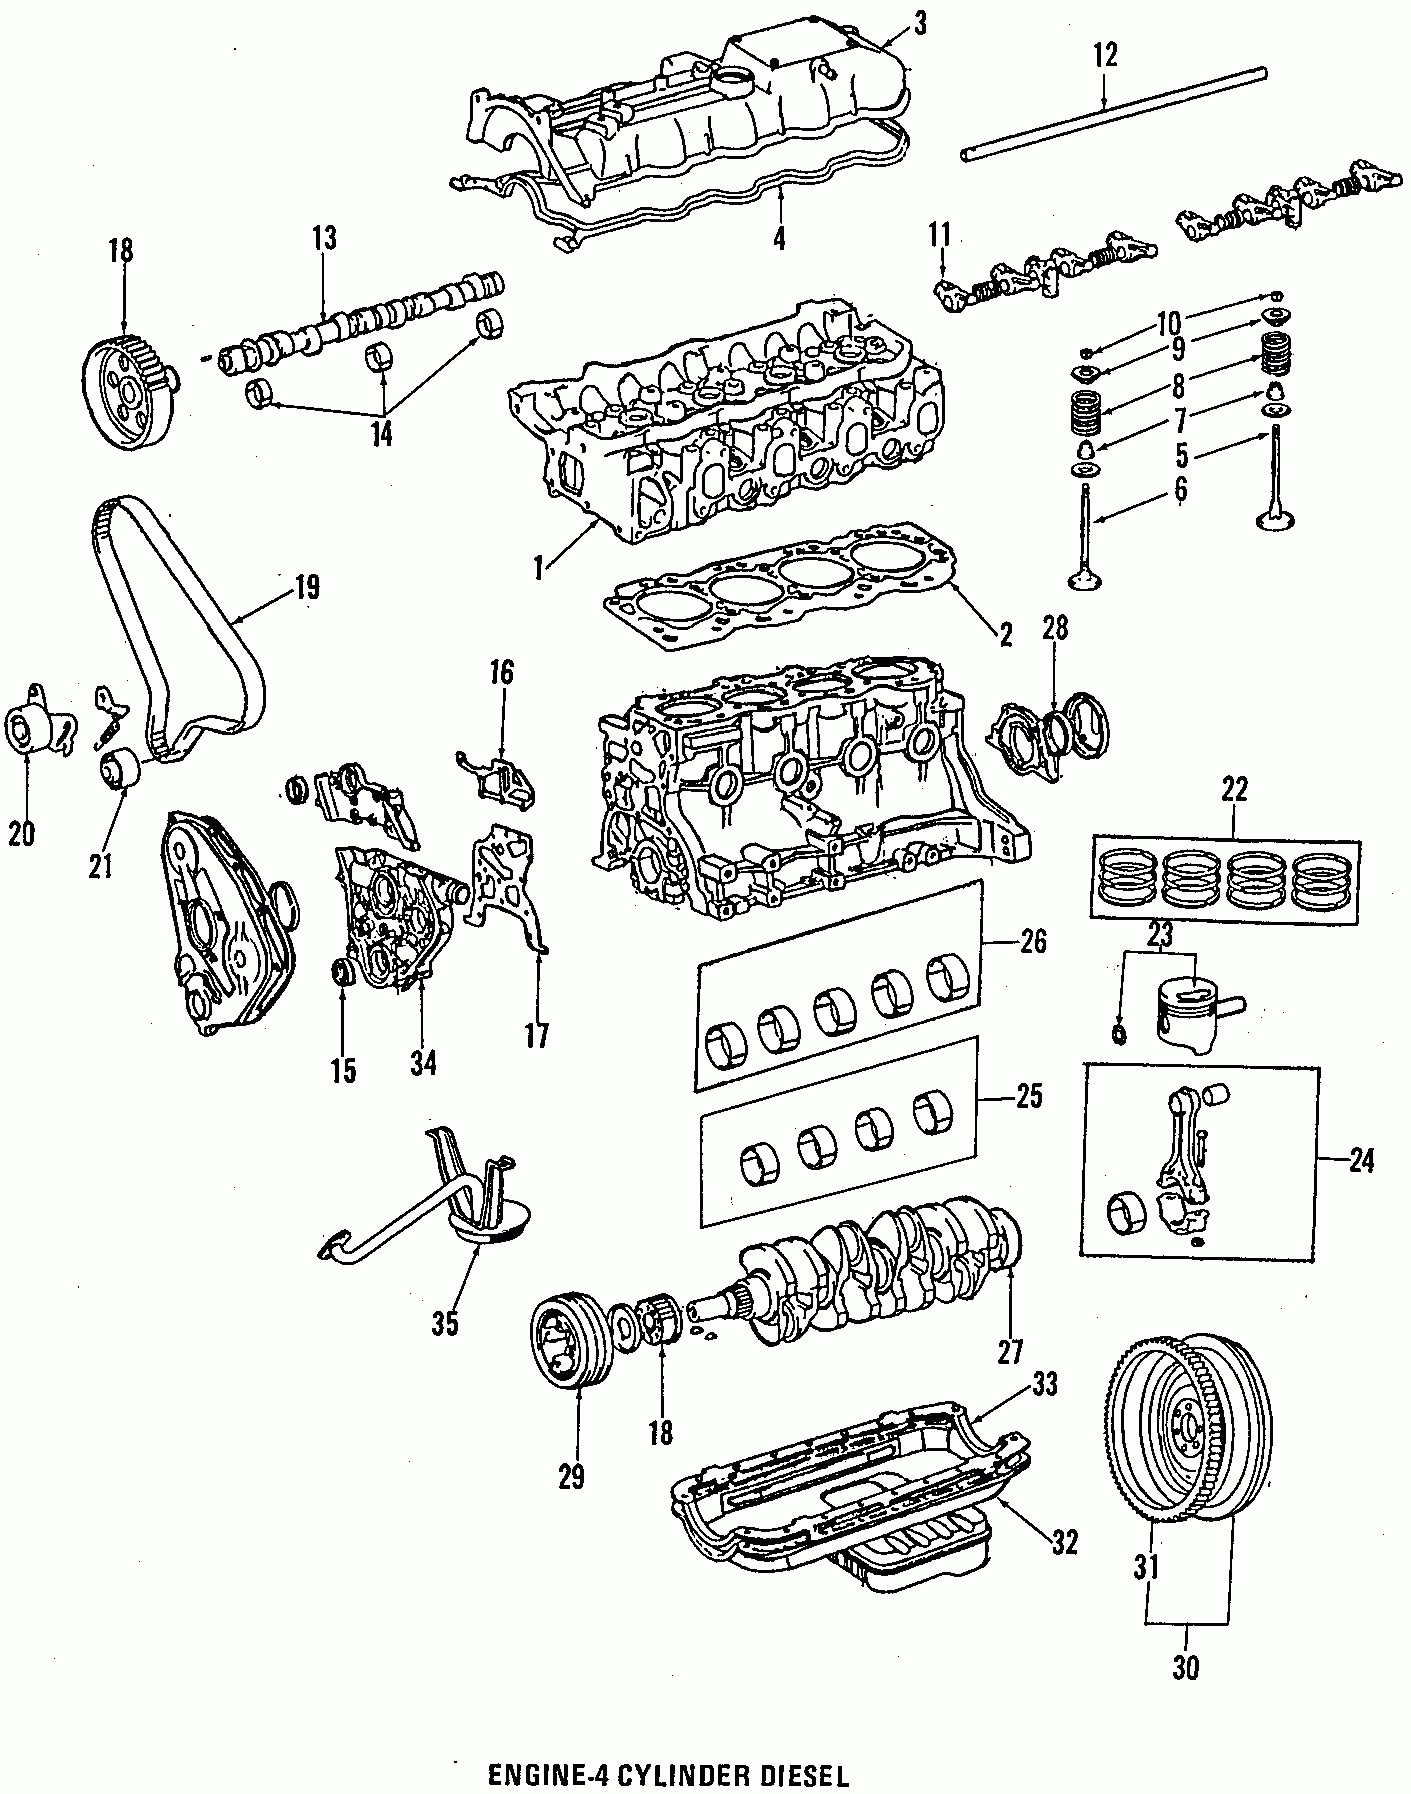 directv wiring diagram swm kenmore parts 2002 toyota highlander engine v6 library